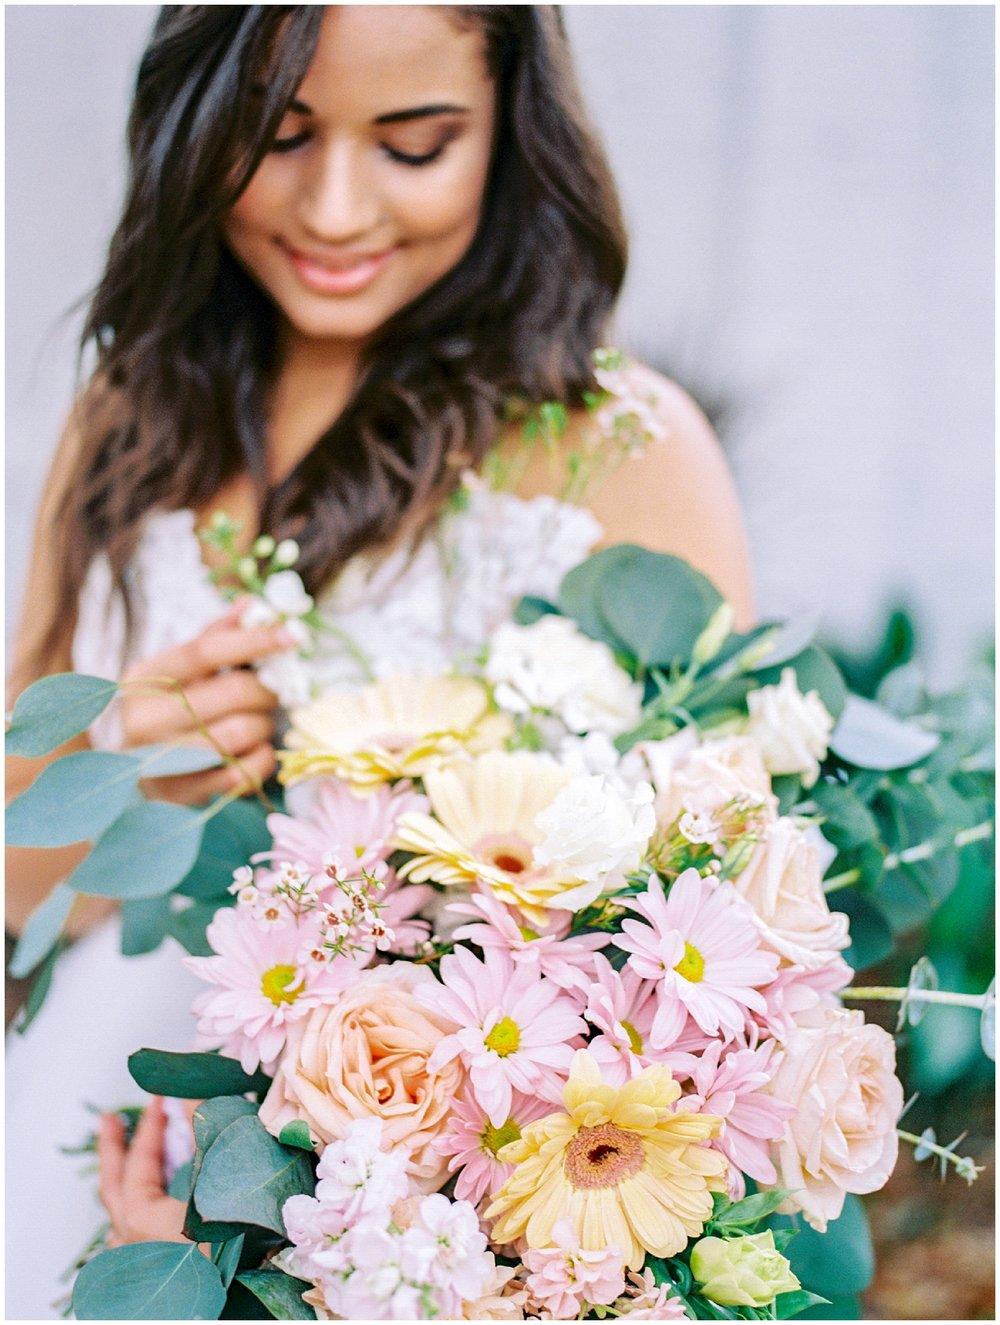 Lisa Silva Photography- Ponte Vedra Beach and Jacksonville, Florida Fine Art Film Wedding Photography- Spring Bridal Shoot at Ellie's Garden in San Marco, Jacksonville_0050.jpg